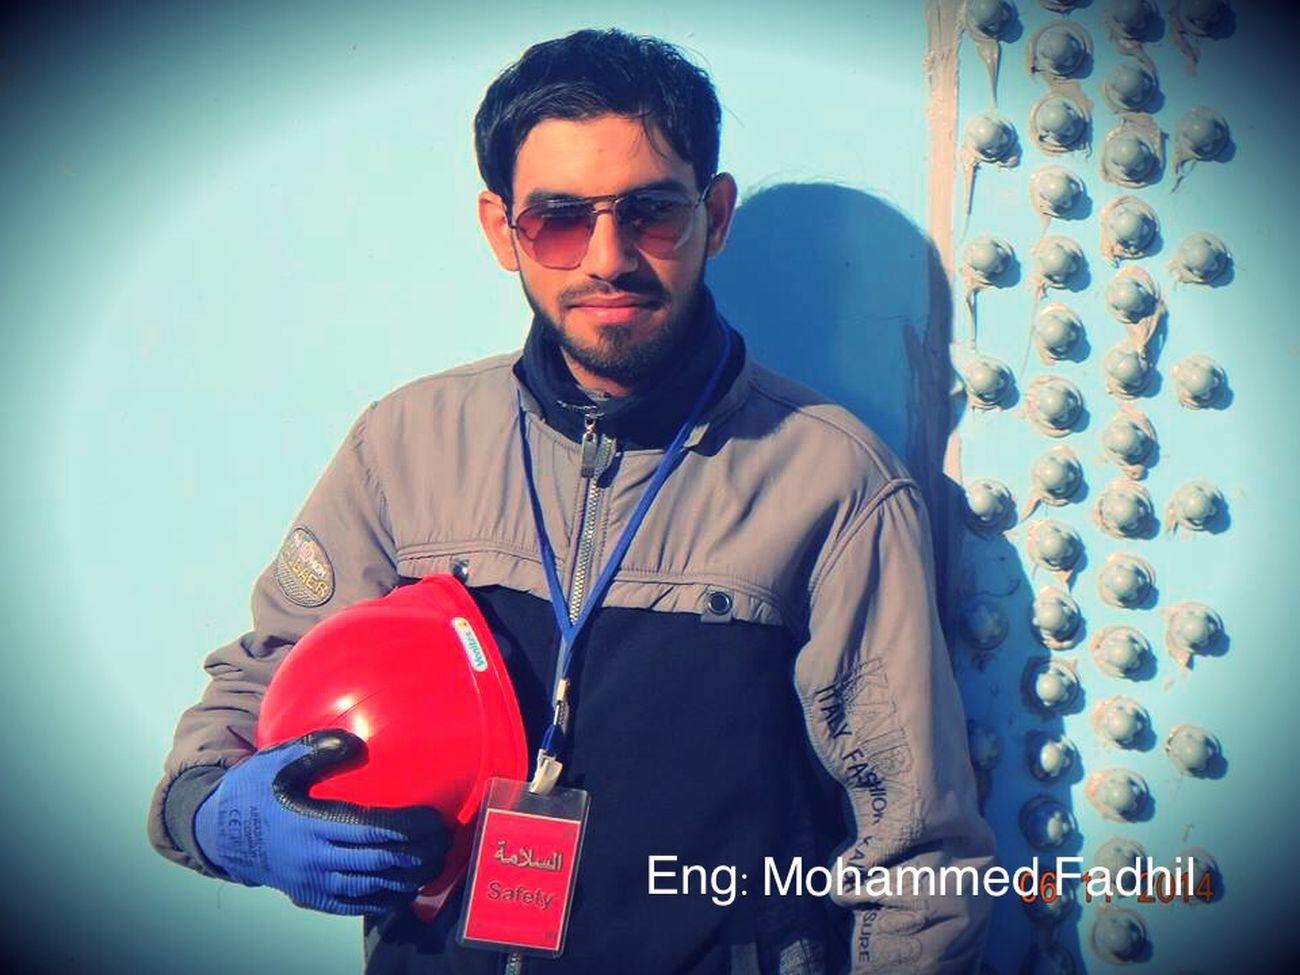 Engineer mohammed fadahil